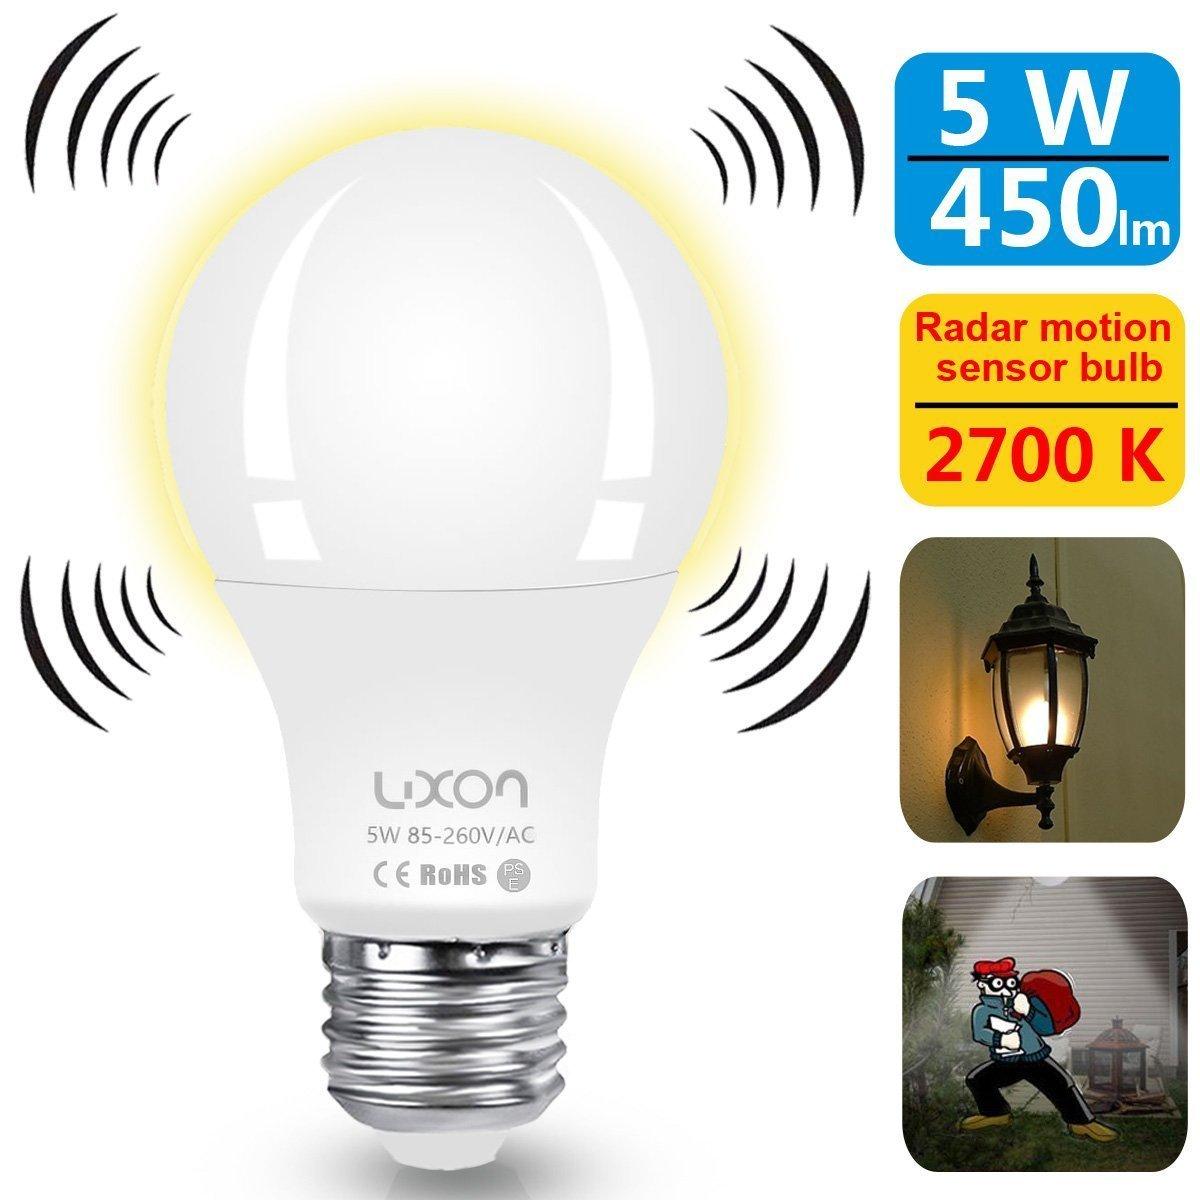 5W Motion Sensor LED Bulb Radar Motion Detector Light $7.80 AC @ Amazon